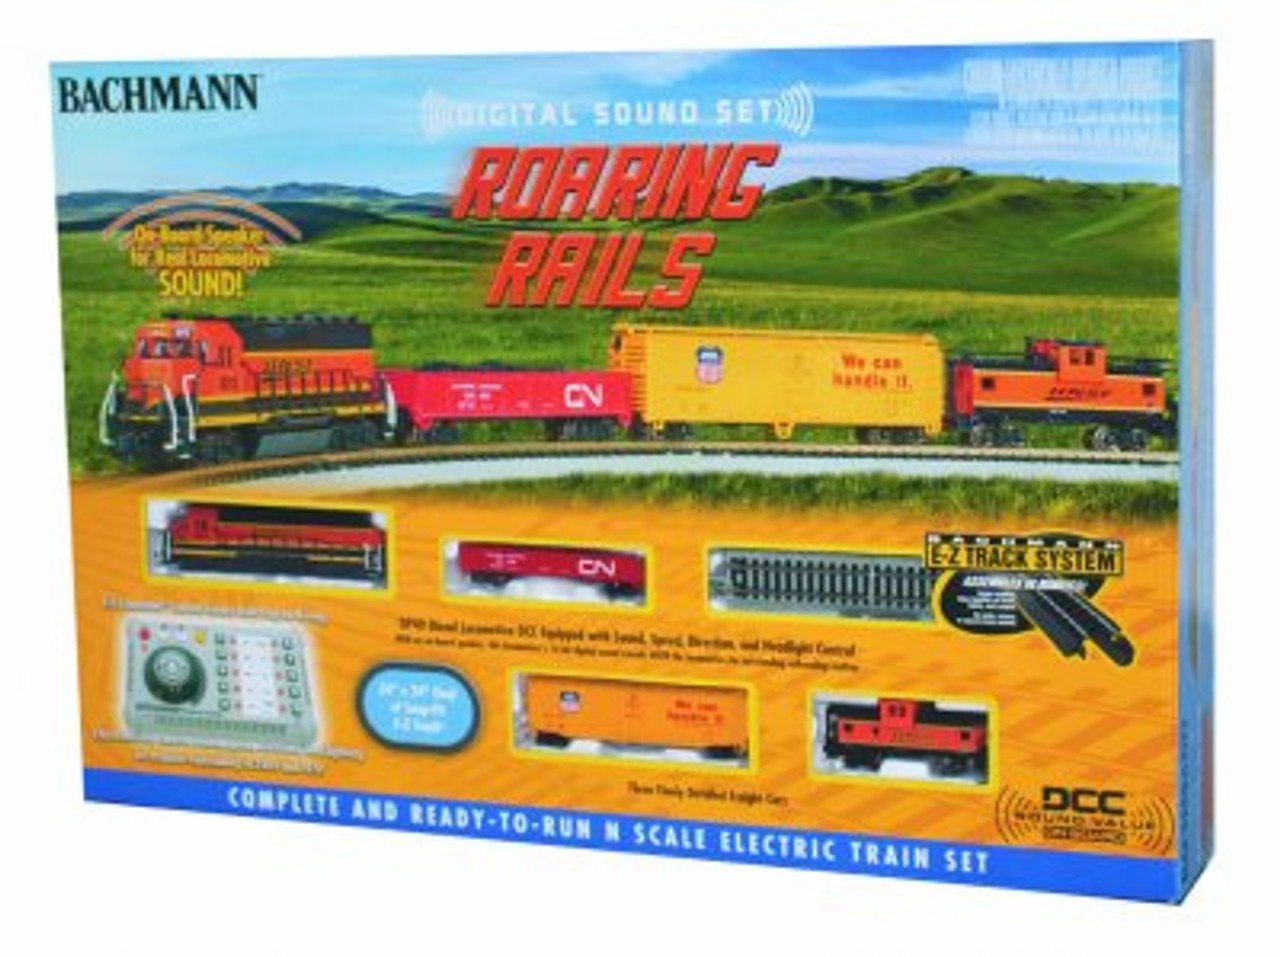 Bachmann N Scale Train Set 24132 - Roaring Rails Set DCC & Sound (SCALE=N) Part#=160-24132